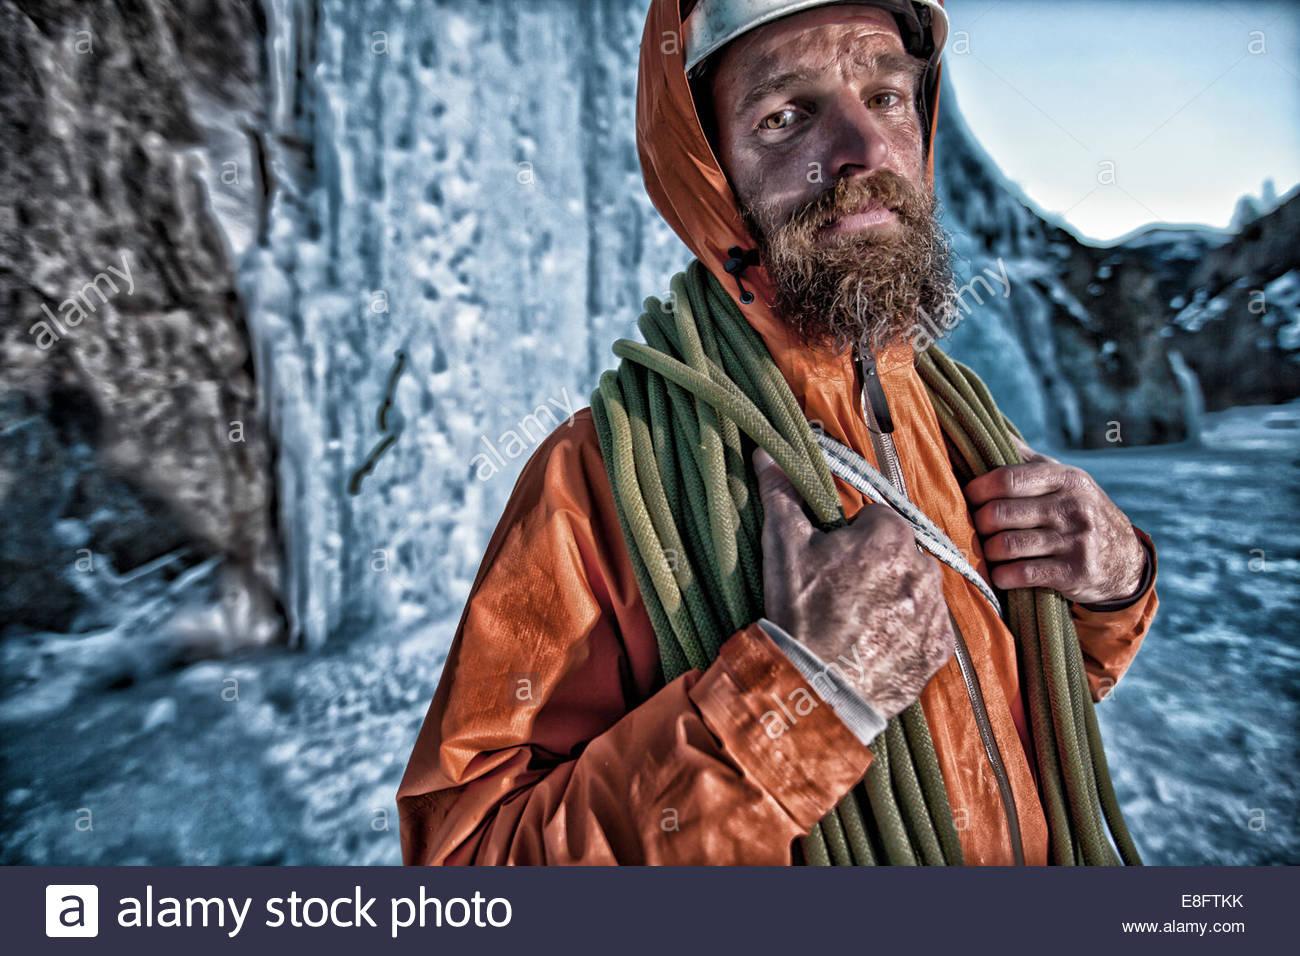 Portrait of male ice climber, Lake City, Colorado, America, USA - Stock Image